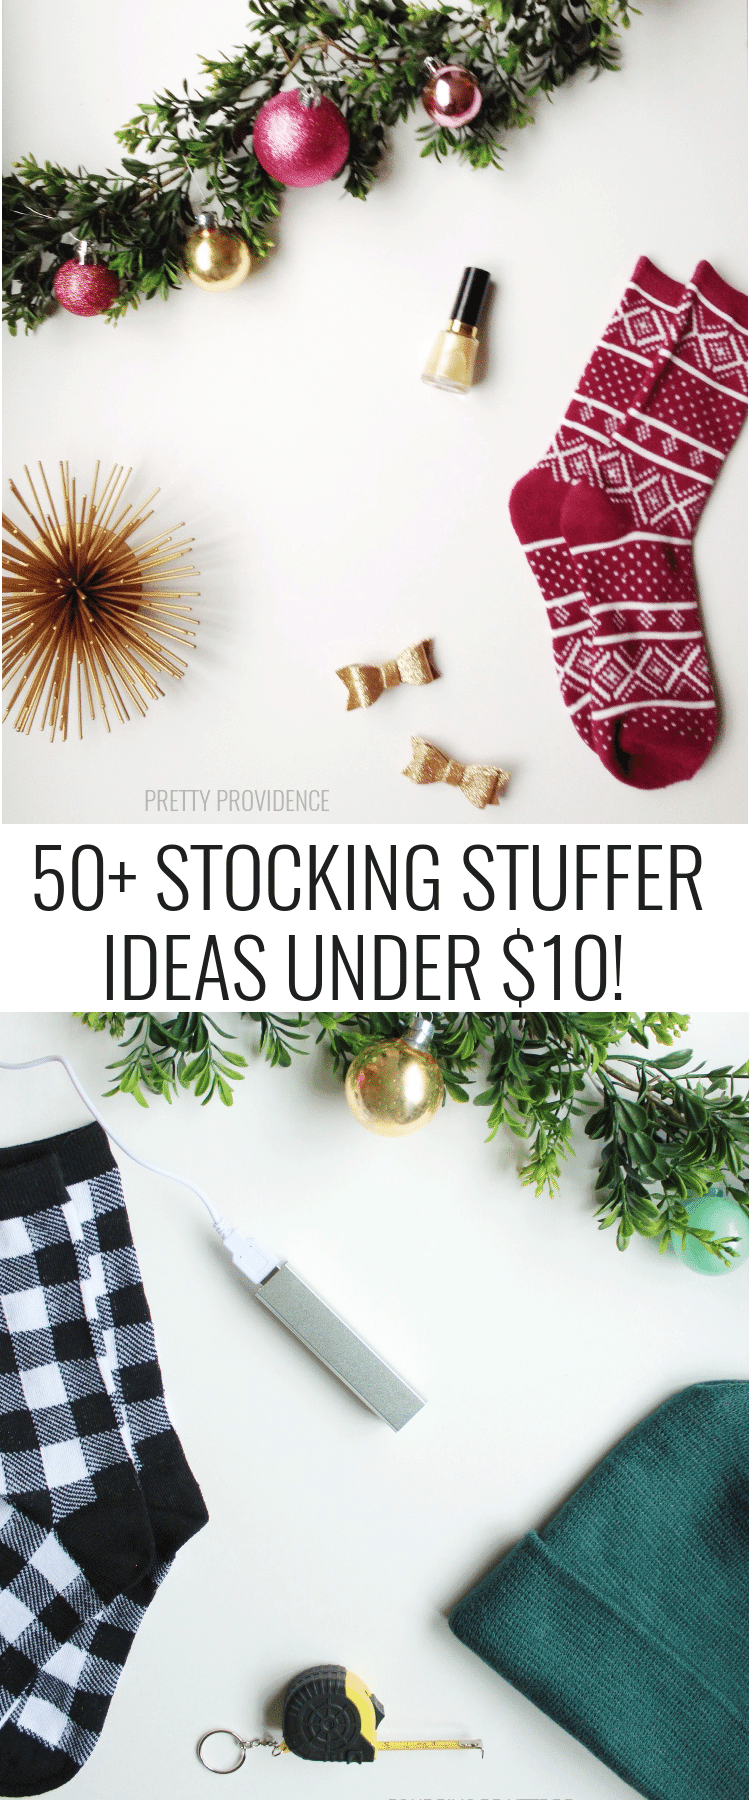 AMAZING list of stocking stuffers!!! prettyprovidence.com